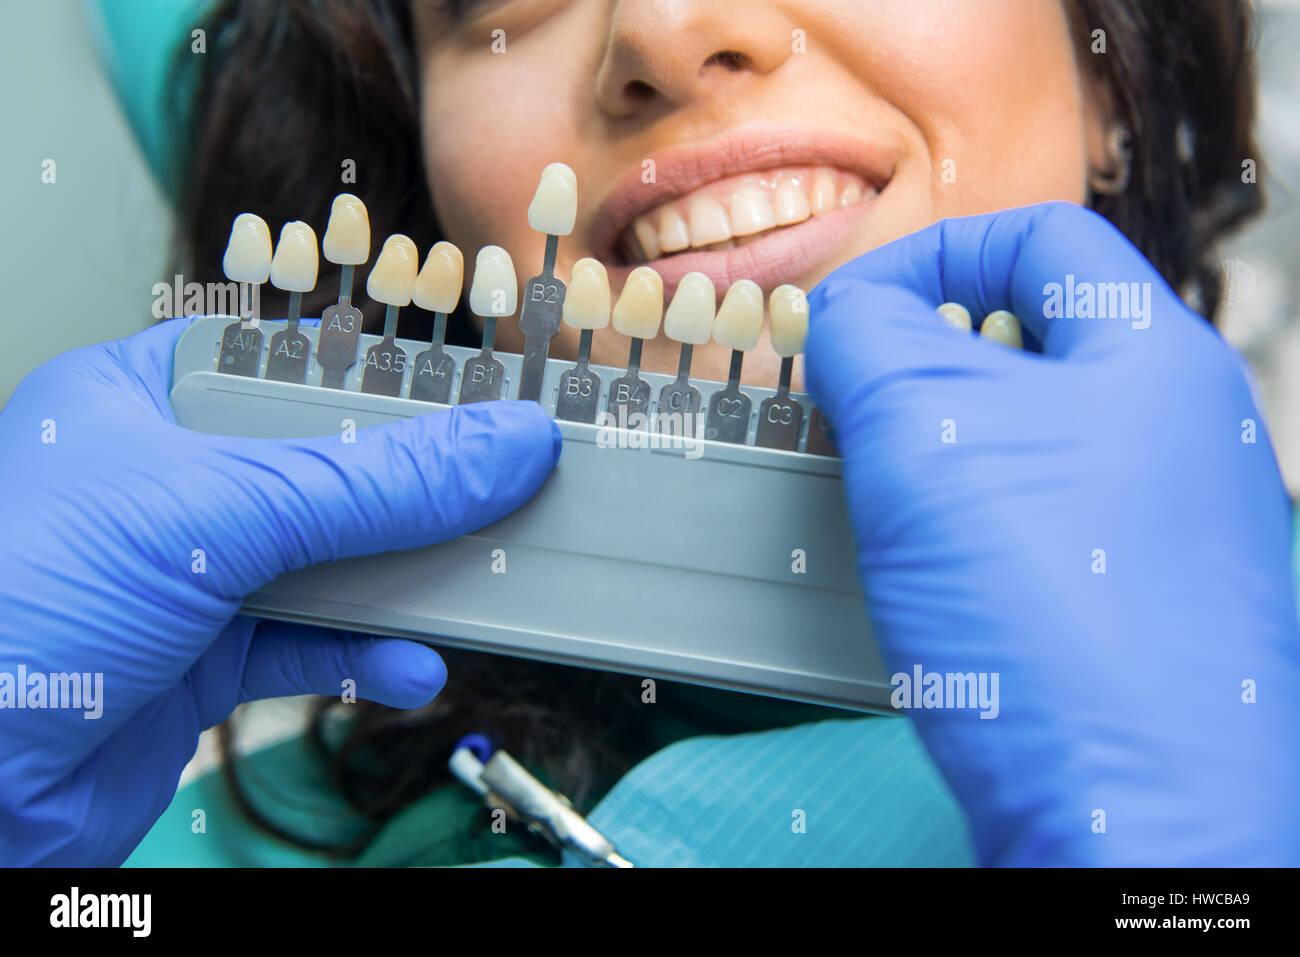 Dental Shade Stock Photos Dental Shade Stock Images Alamy